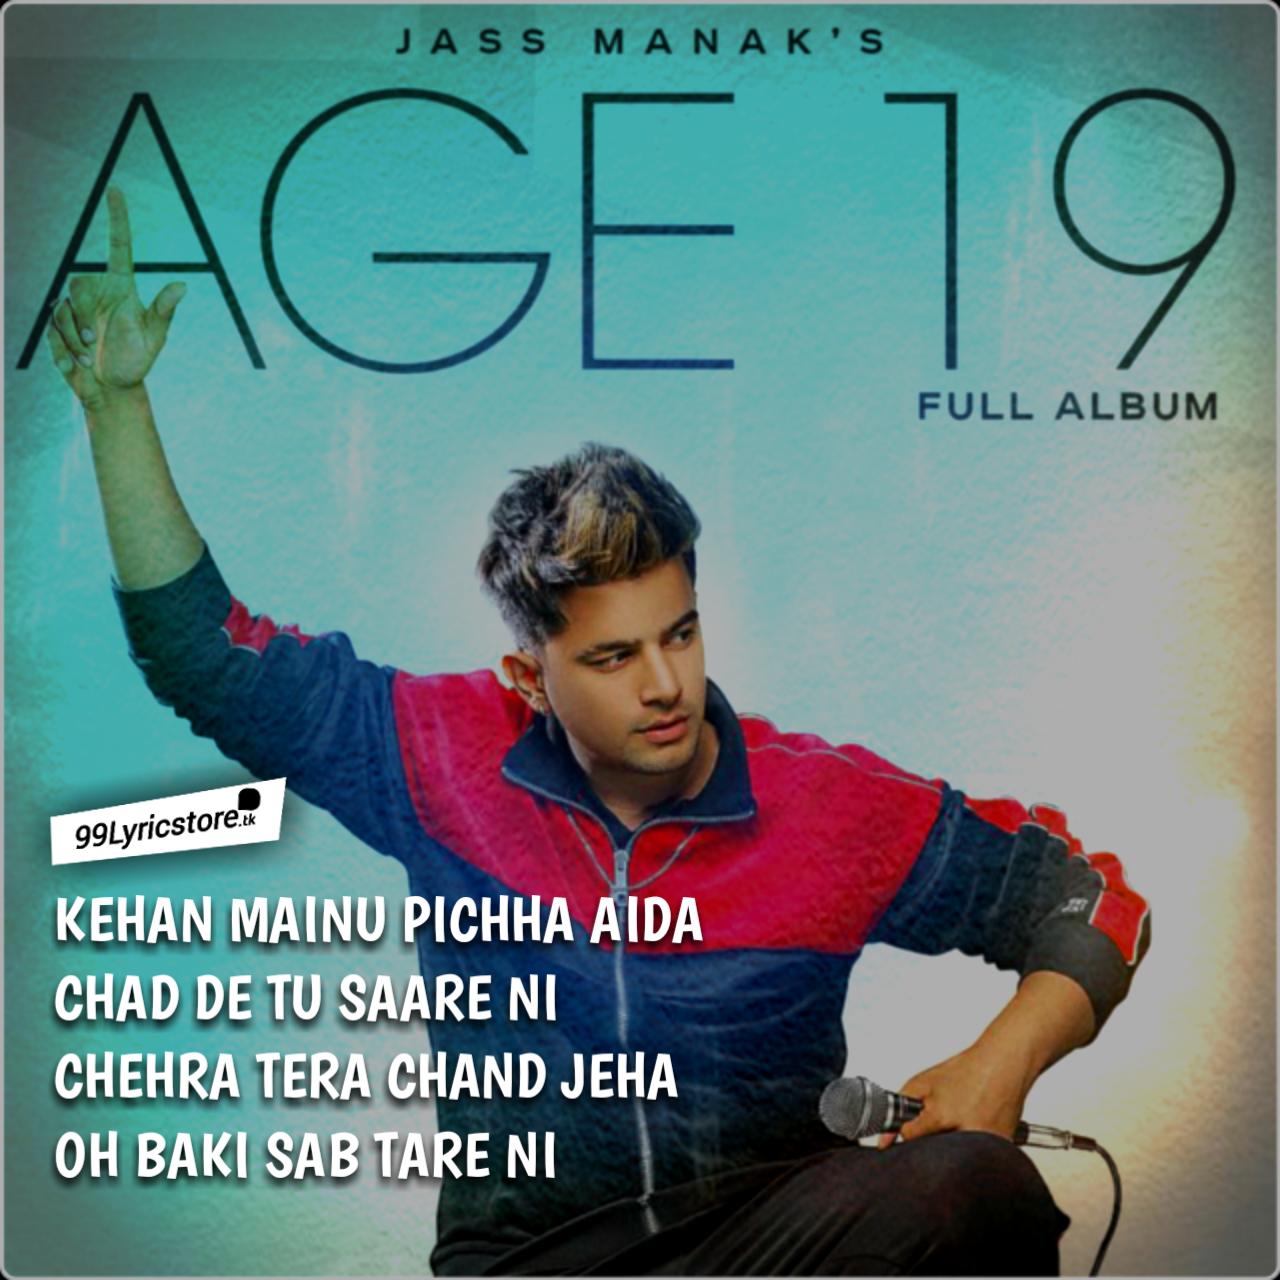 Jass Manak Song Chehra Tera Lyrics Age 19